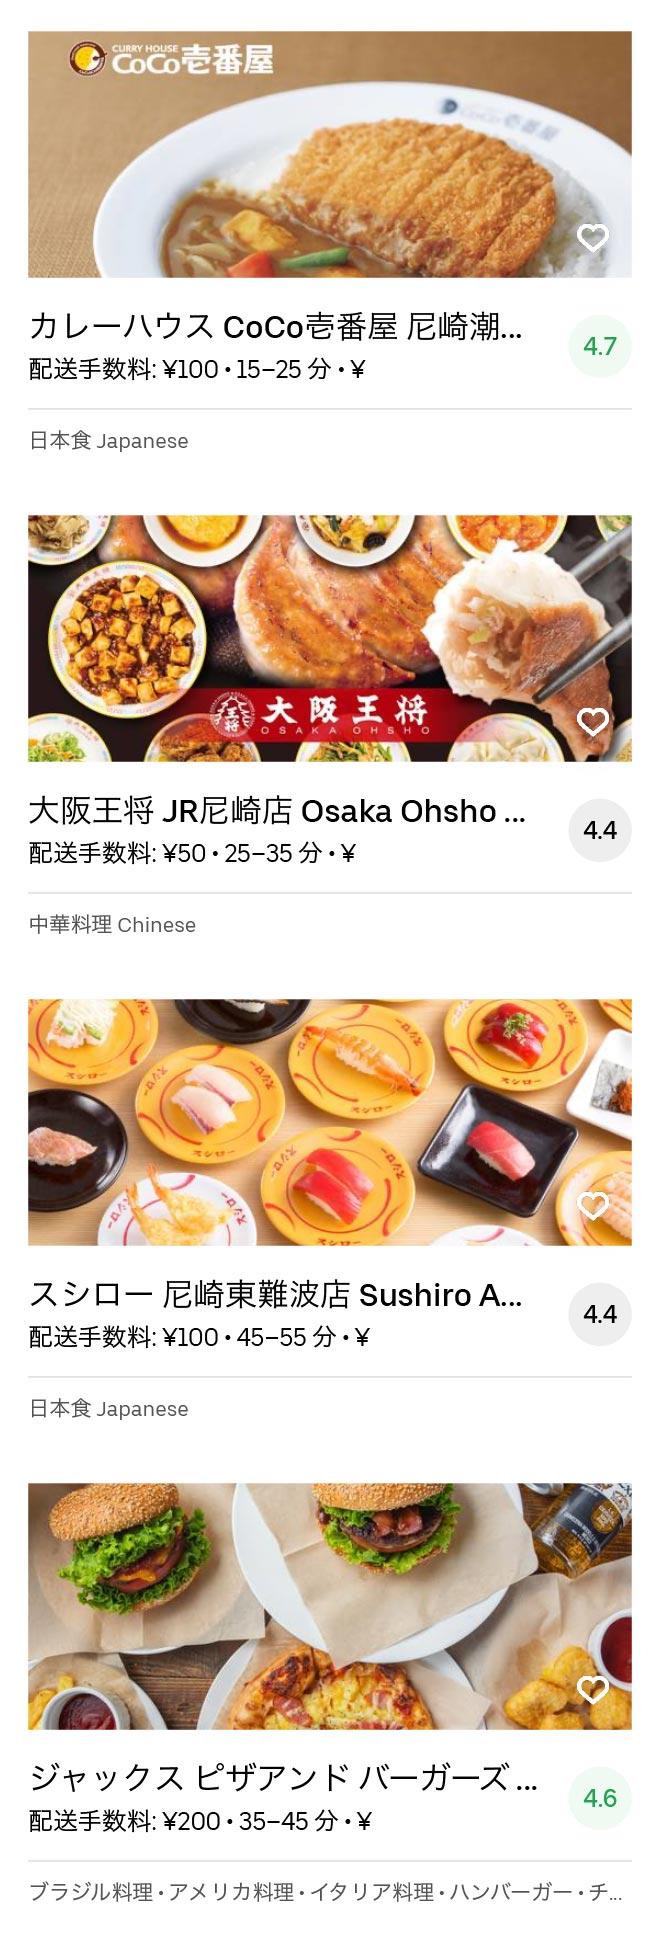 Amagasaki menu 2005 02